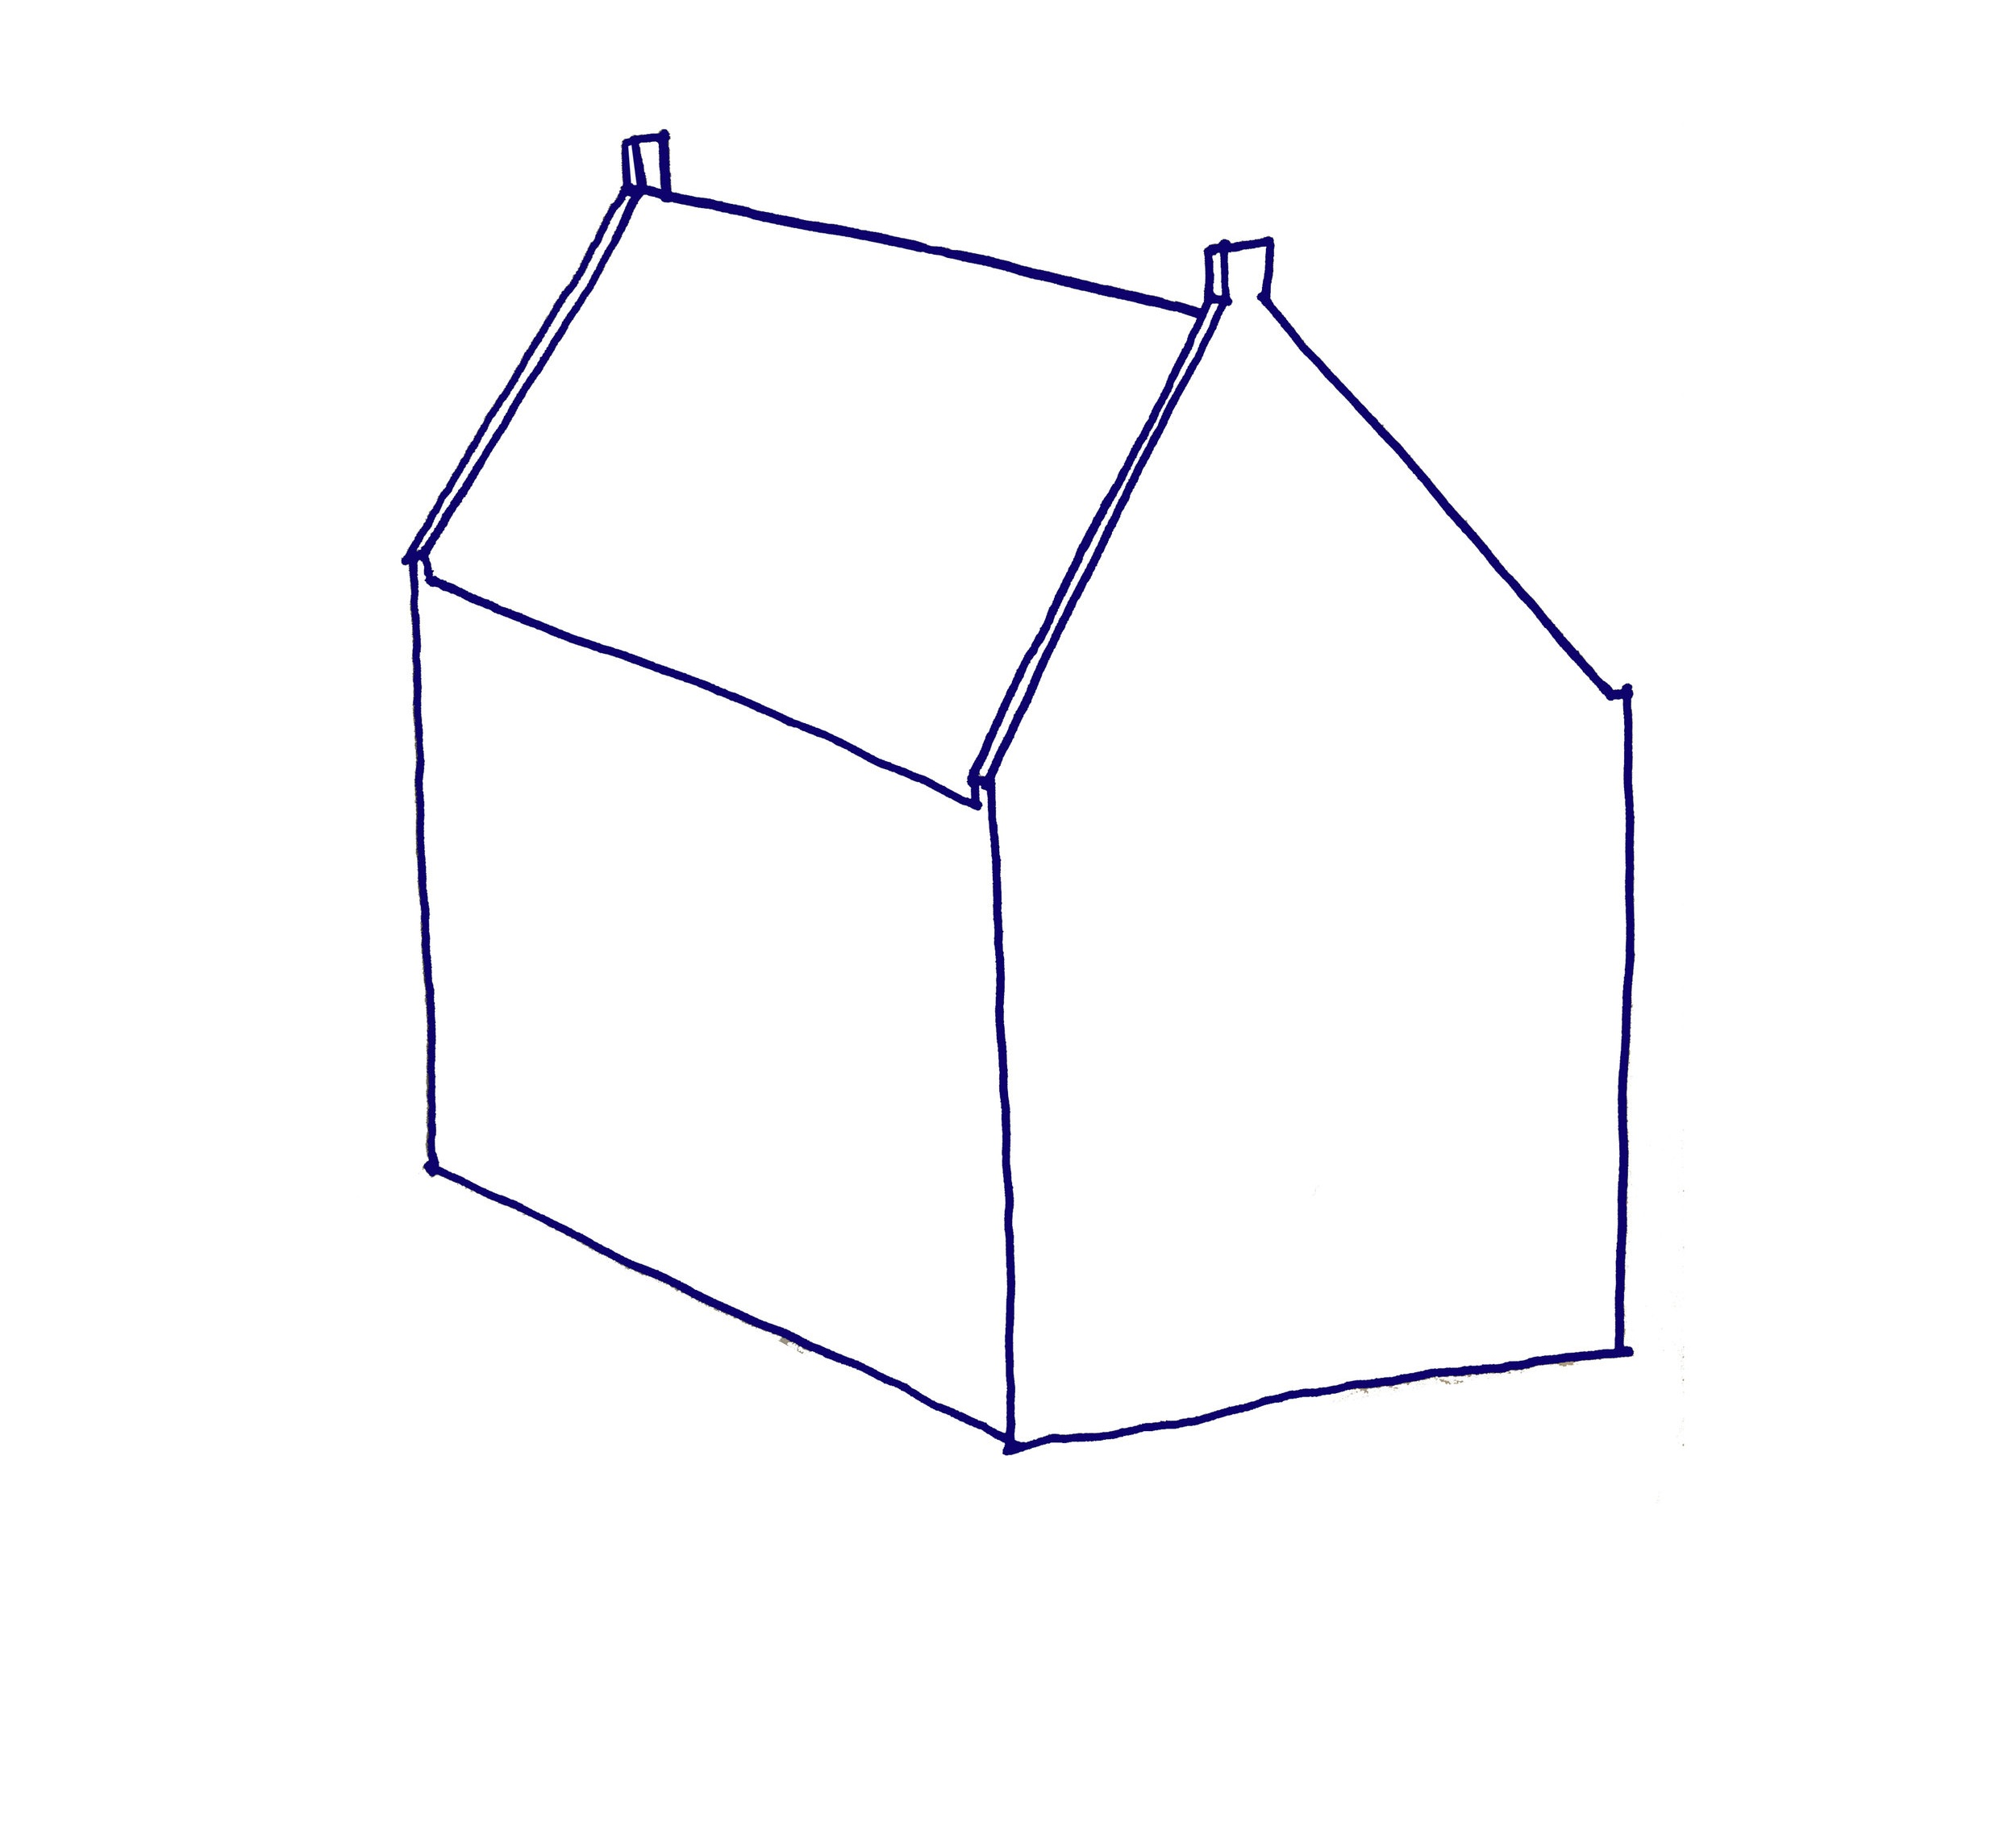 house+-+blue+1.0.jpg